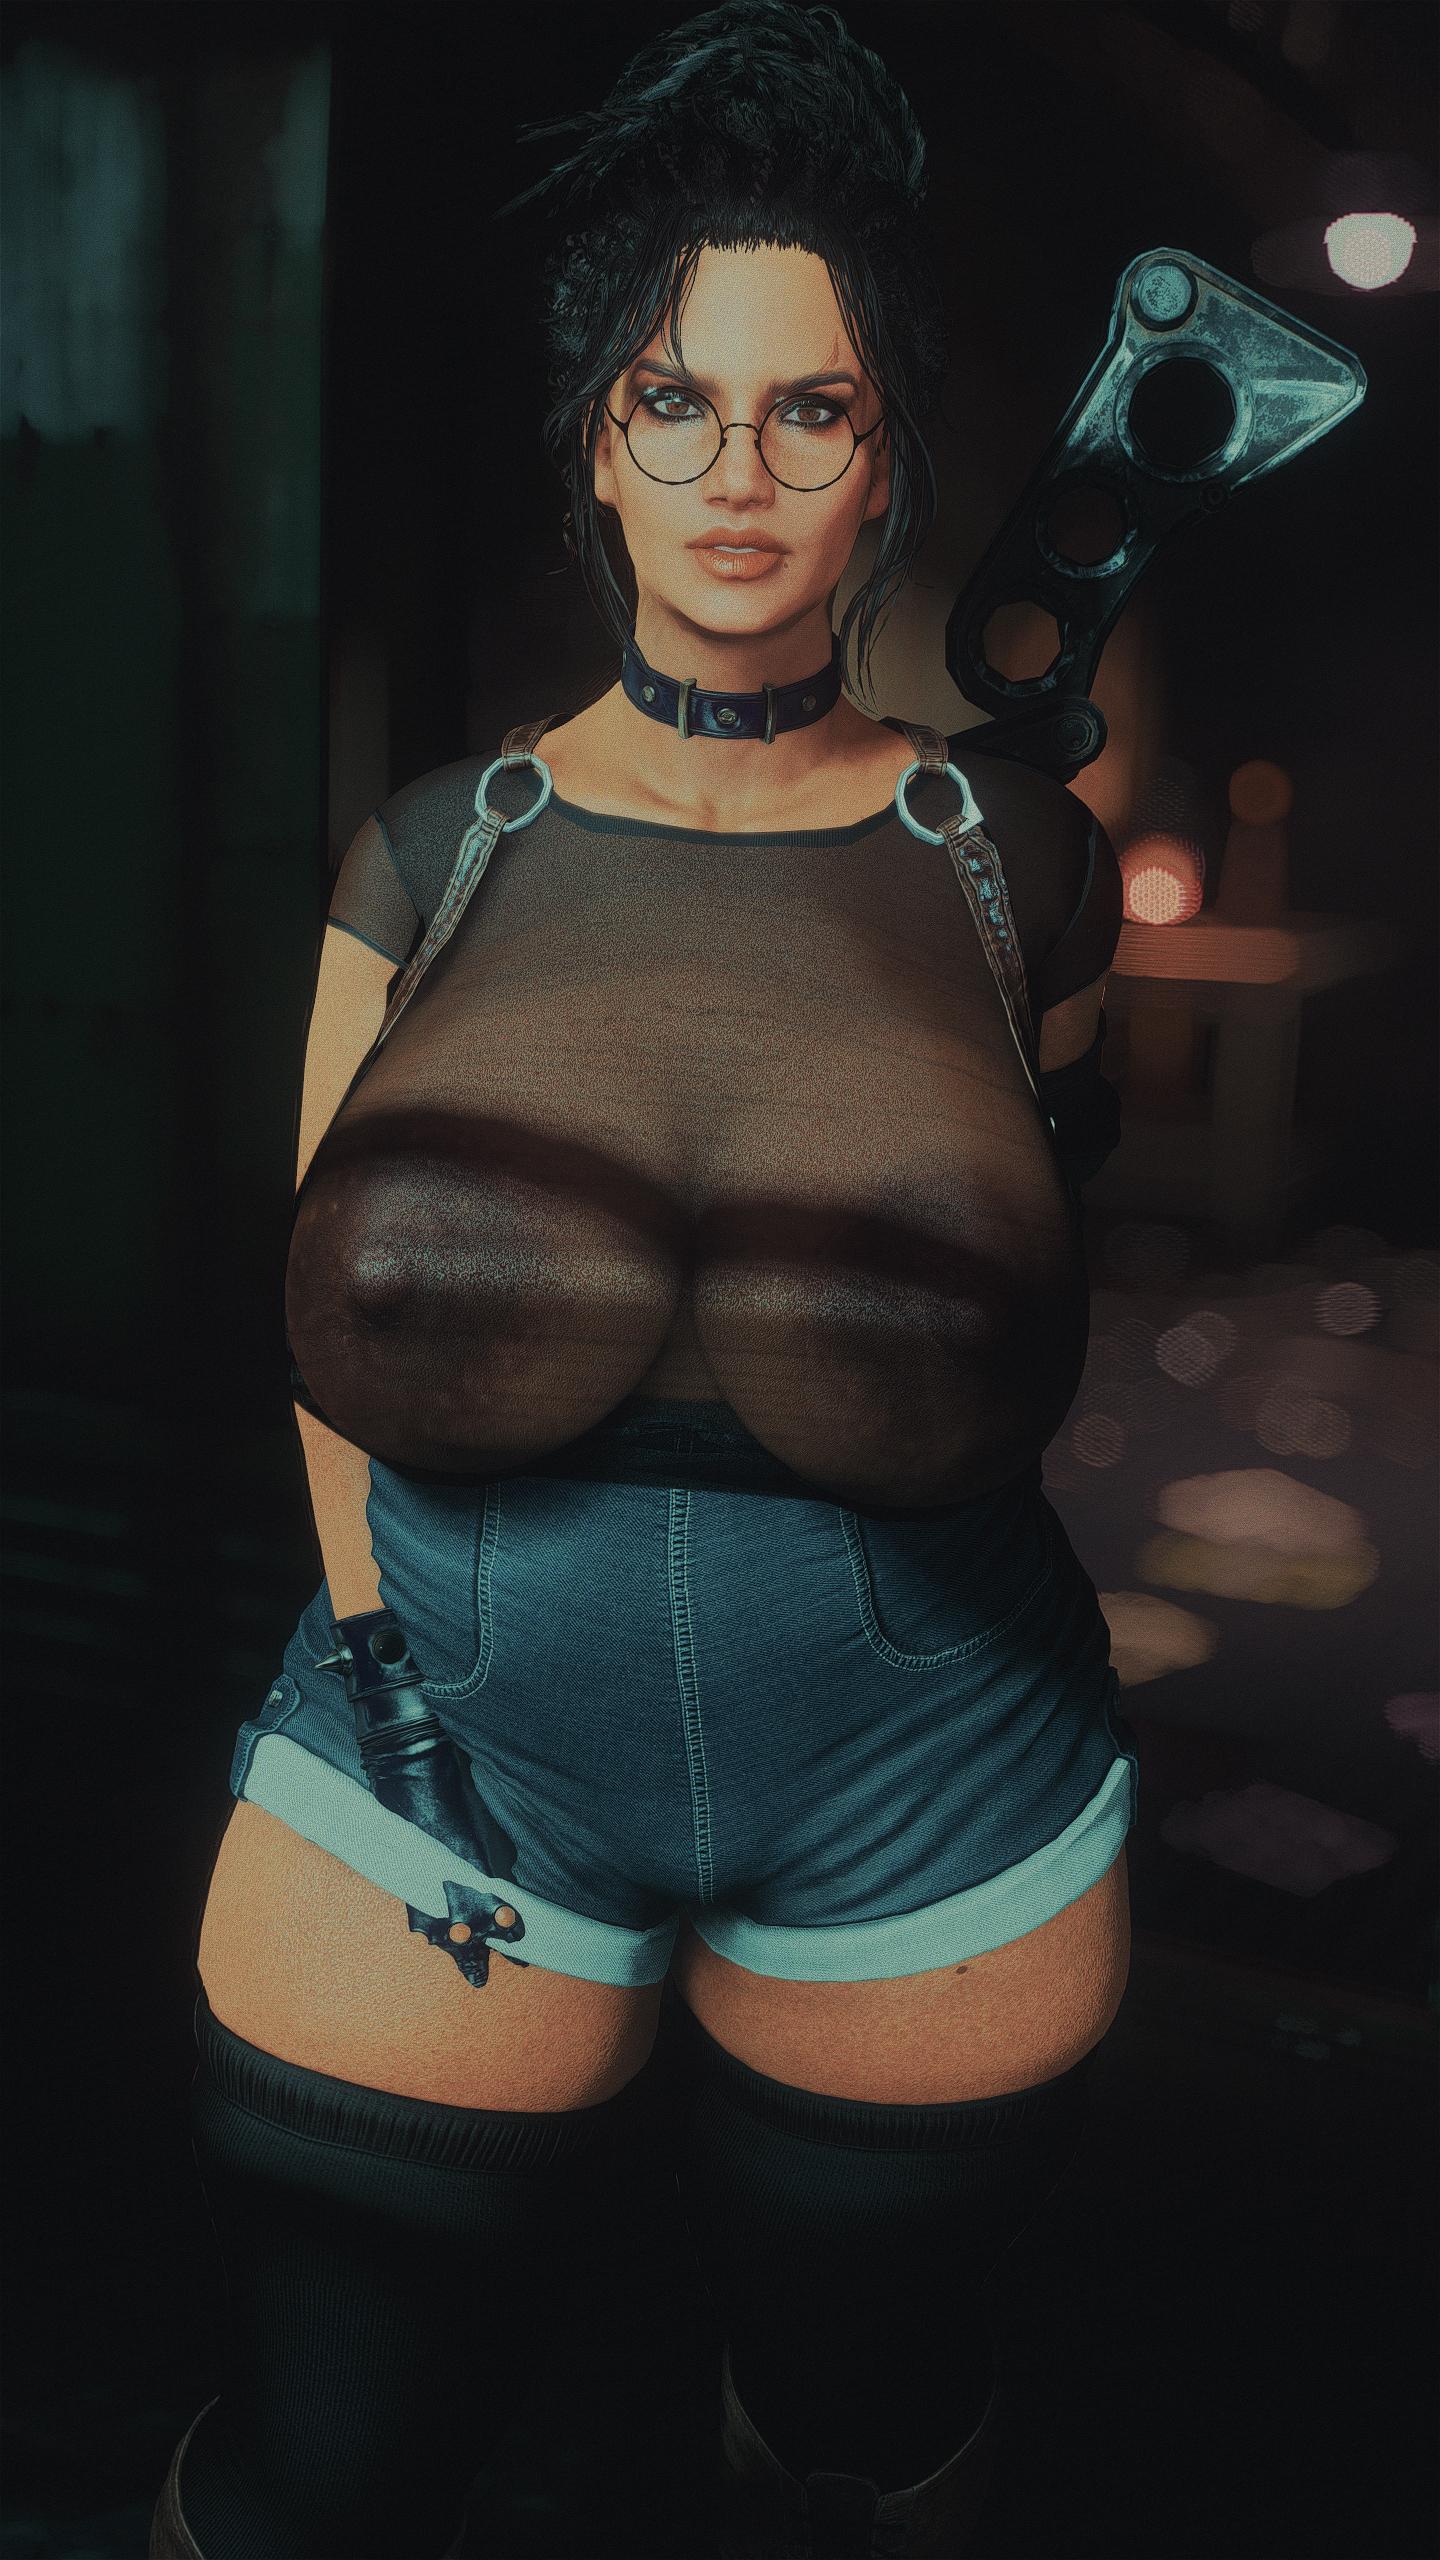 Fallout4-2021-03-05-21-57-31.jpg